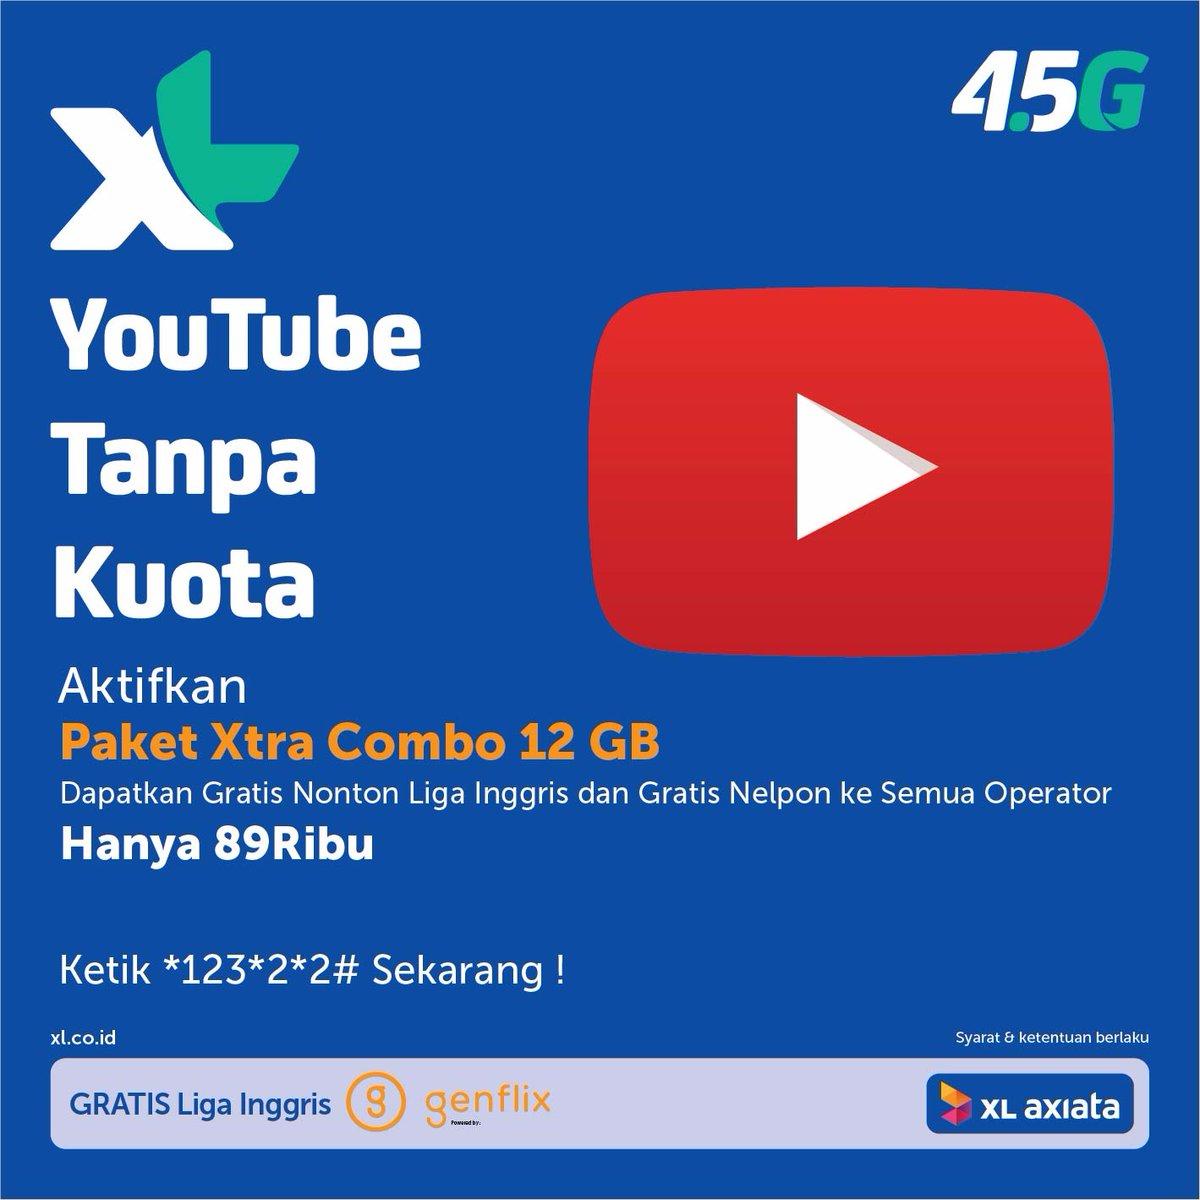 Xl Perdana 4g Lte Xtra Combo 18gb Gratis Unlimited Youtube Nelpon 60 Ter 31gb Kuota 31 Gb 18 Di 3g Dan 12 1 Source Kartu Paket Top Xlyoutubetanpakuota